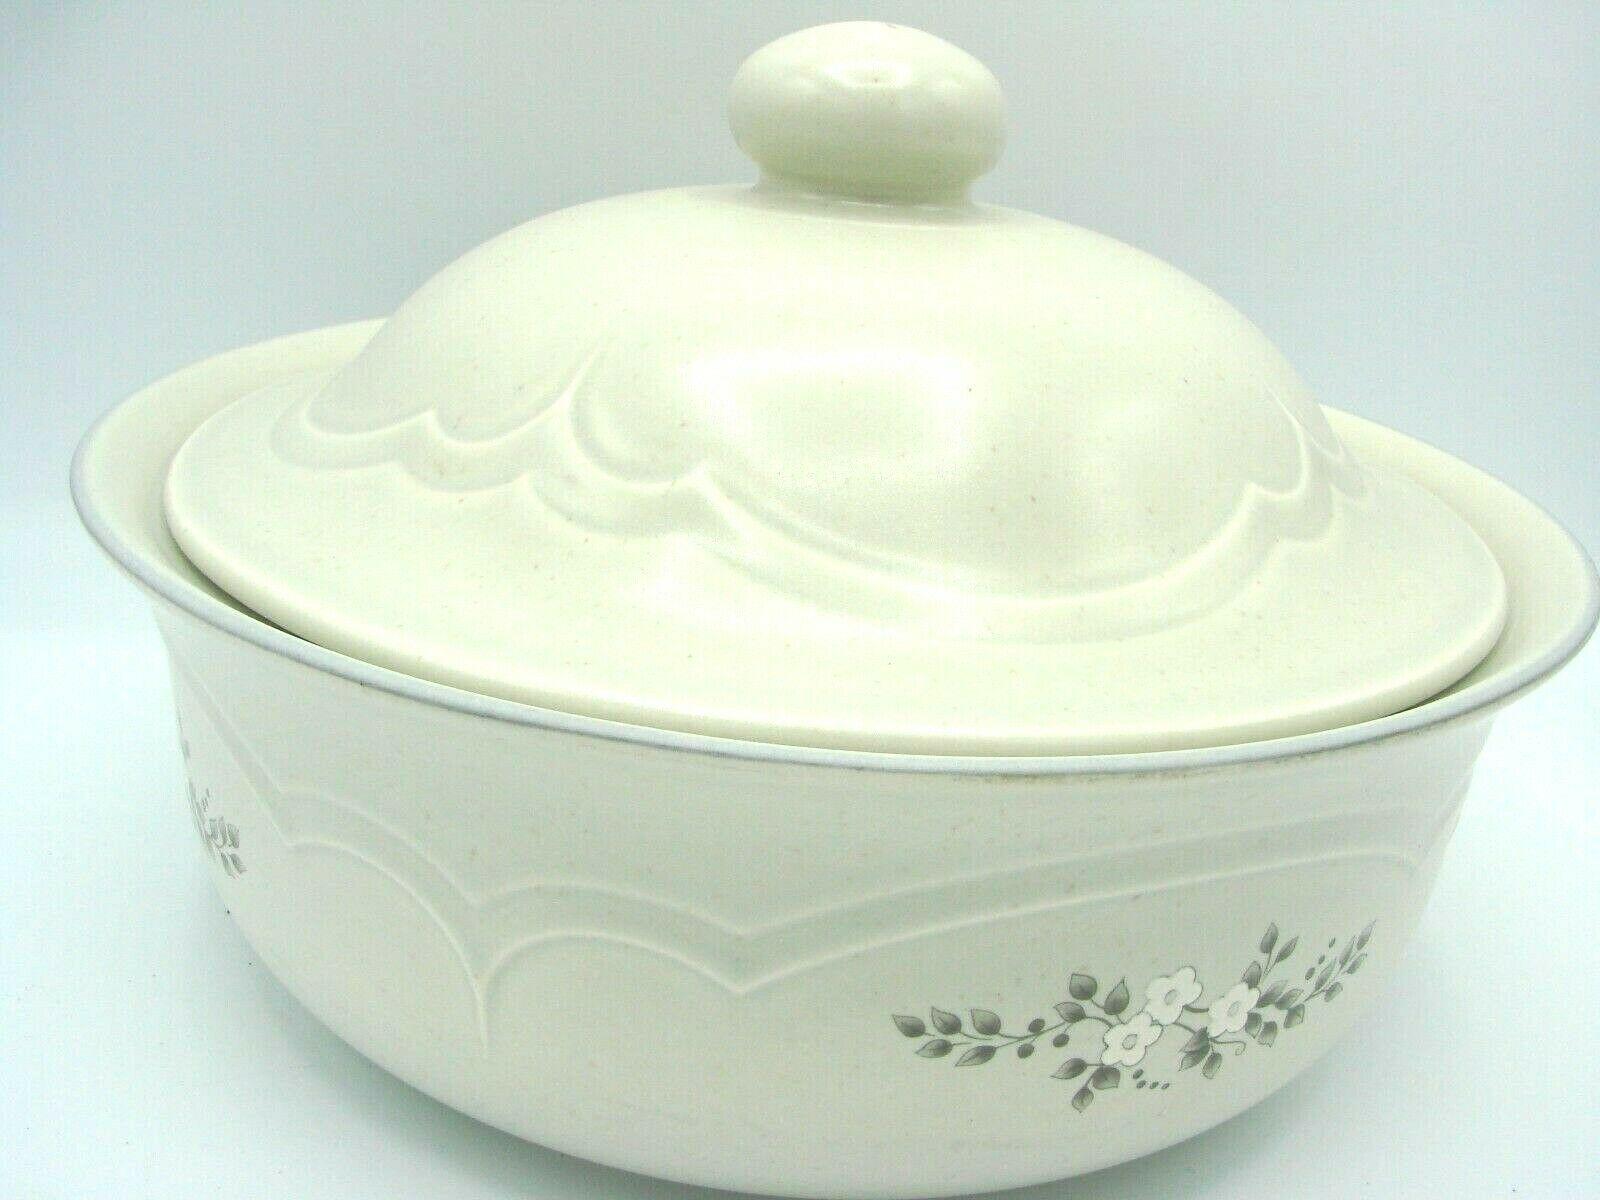 Pristine Pfaltzgraff Heirloom Covered Casserole Dish 8.75 2 Quart White Flowers